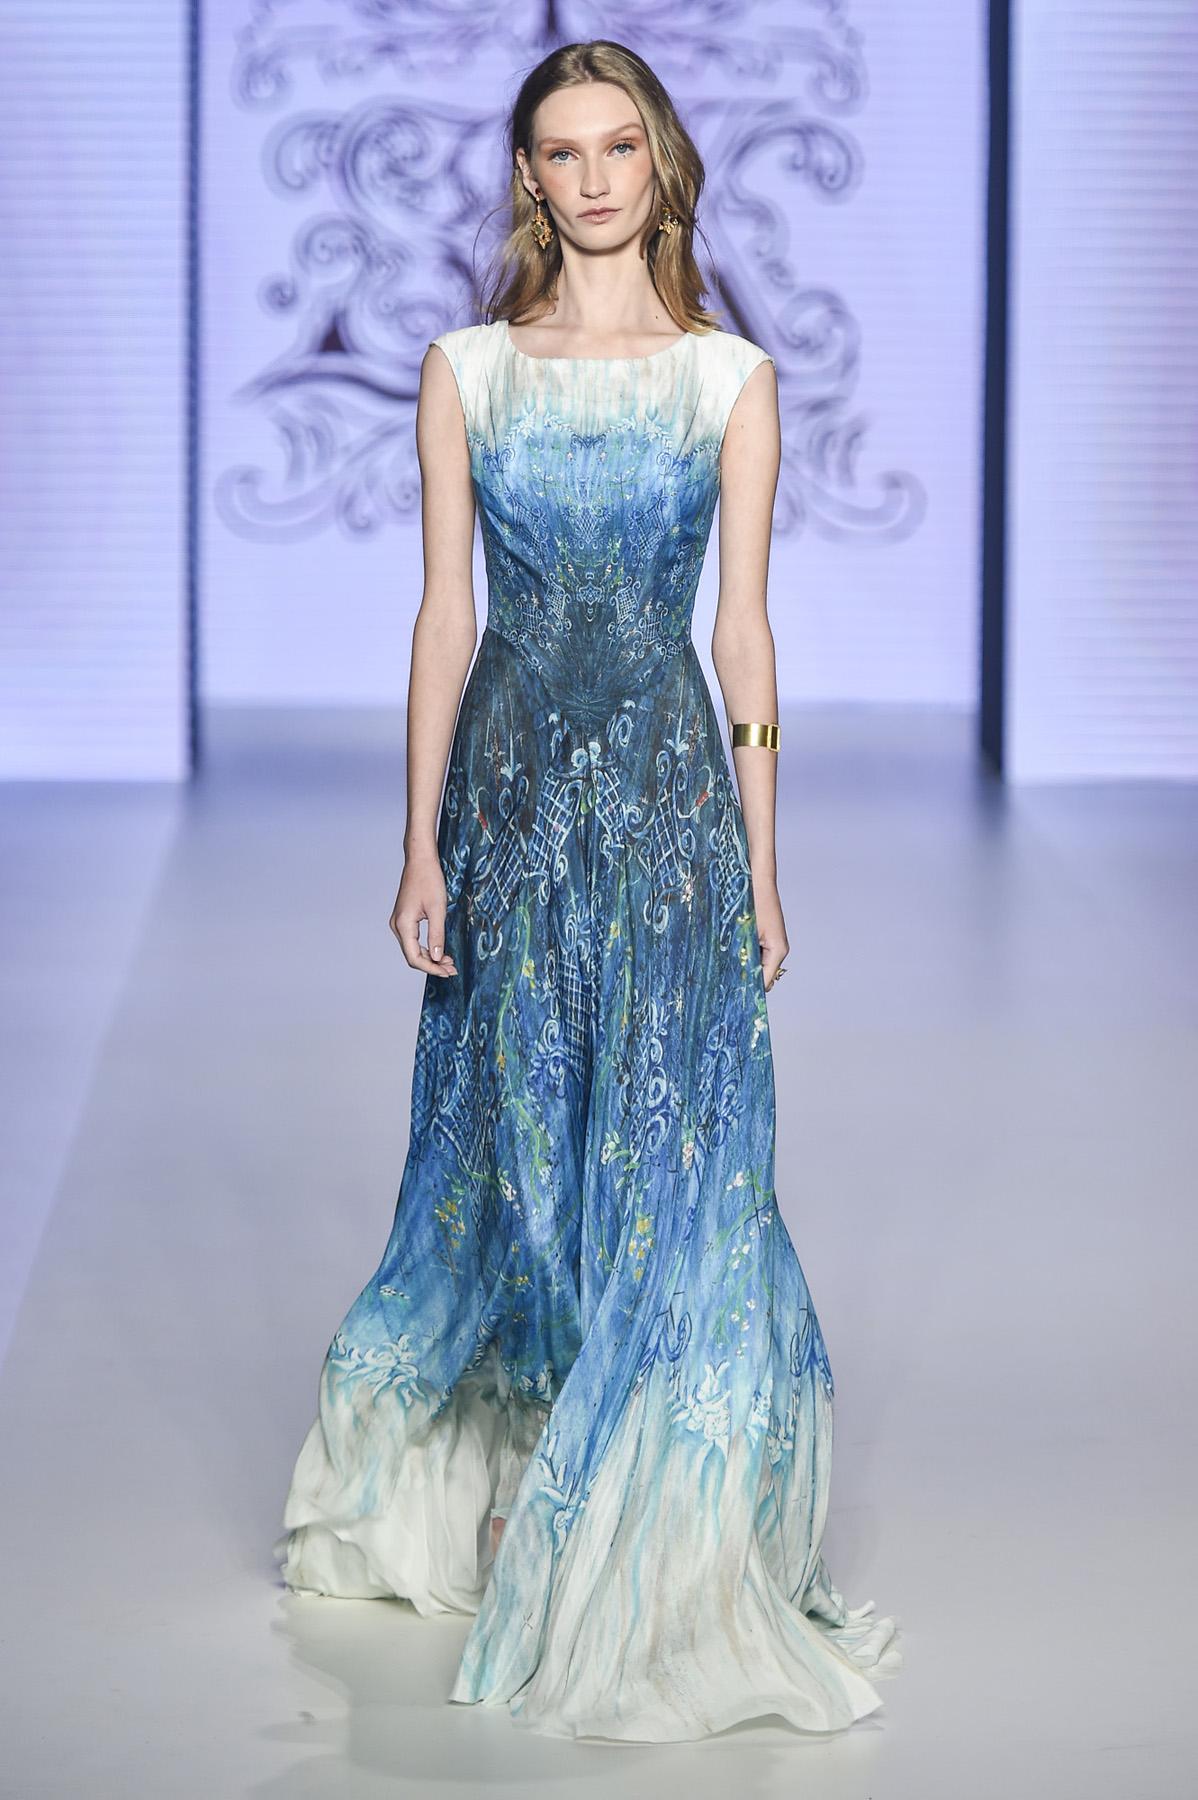 vestido de festa longo azul e branco estampado